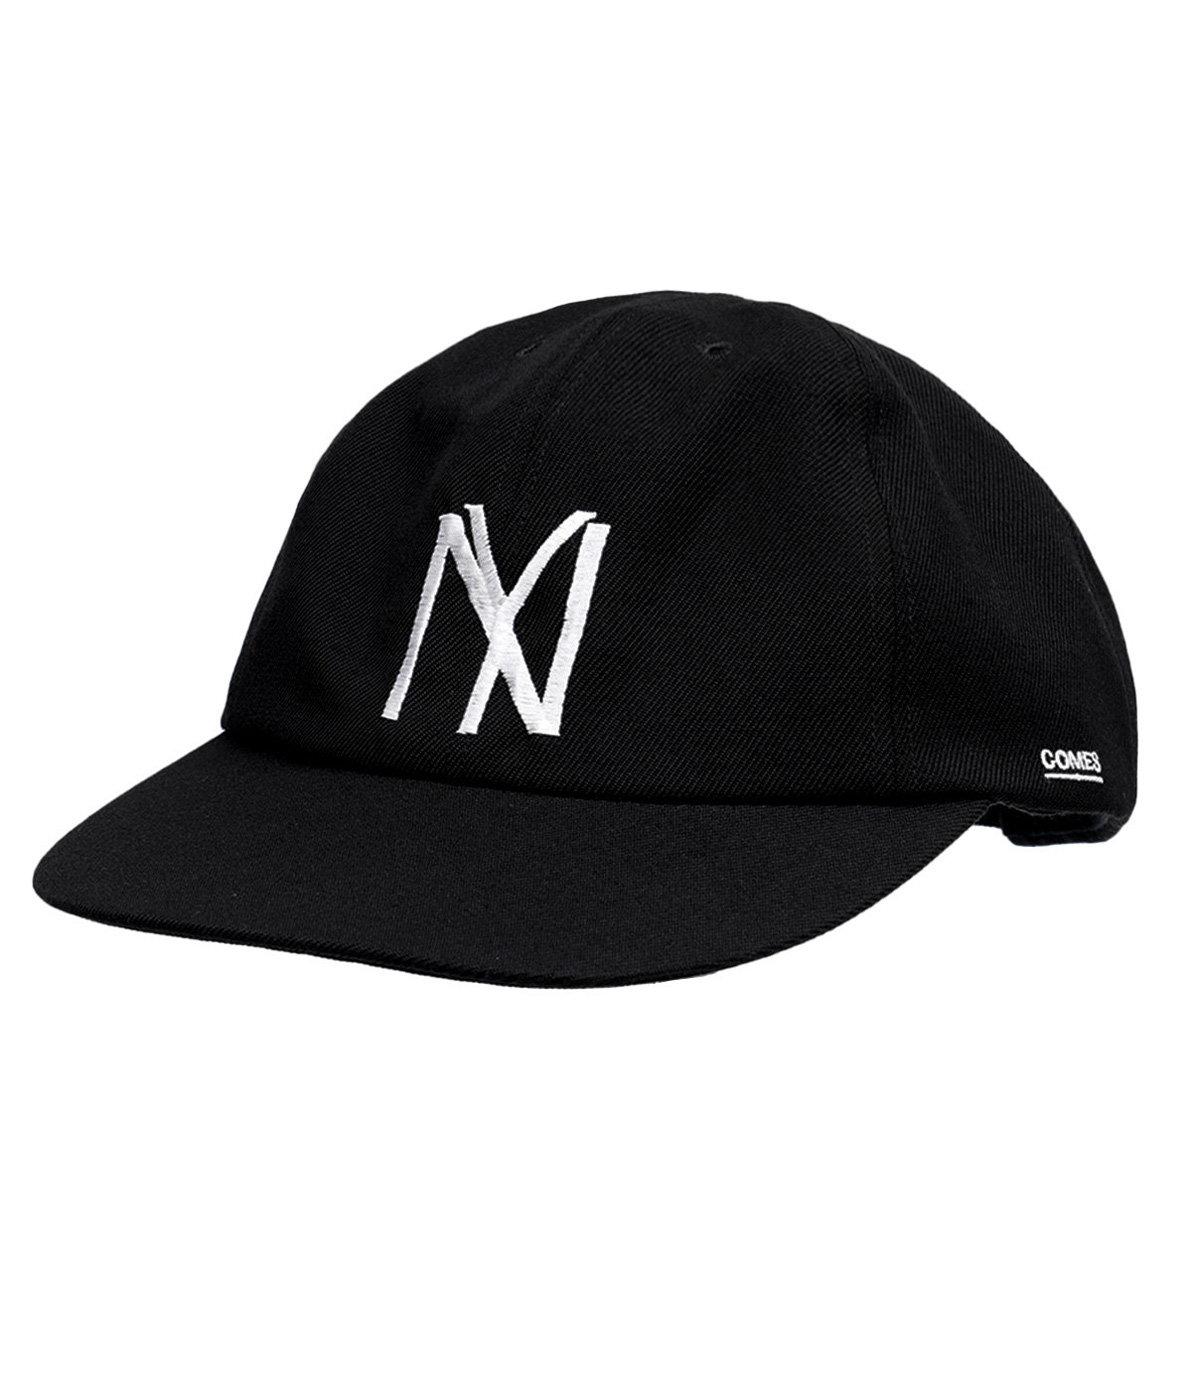 【予約】×COOPERSTOWN BALL CAP BLACK YANKEES CAP